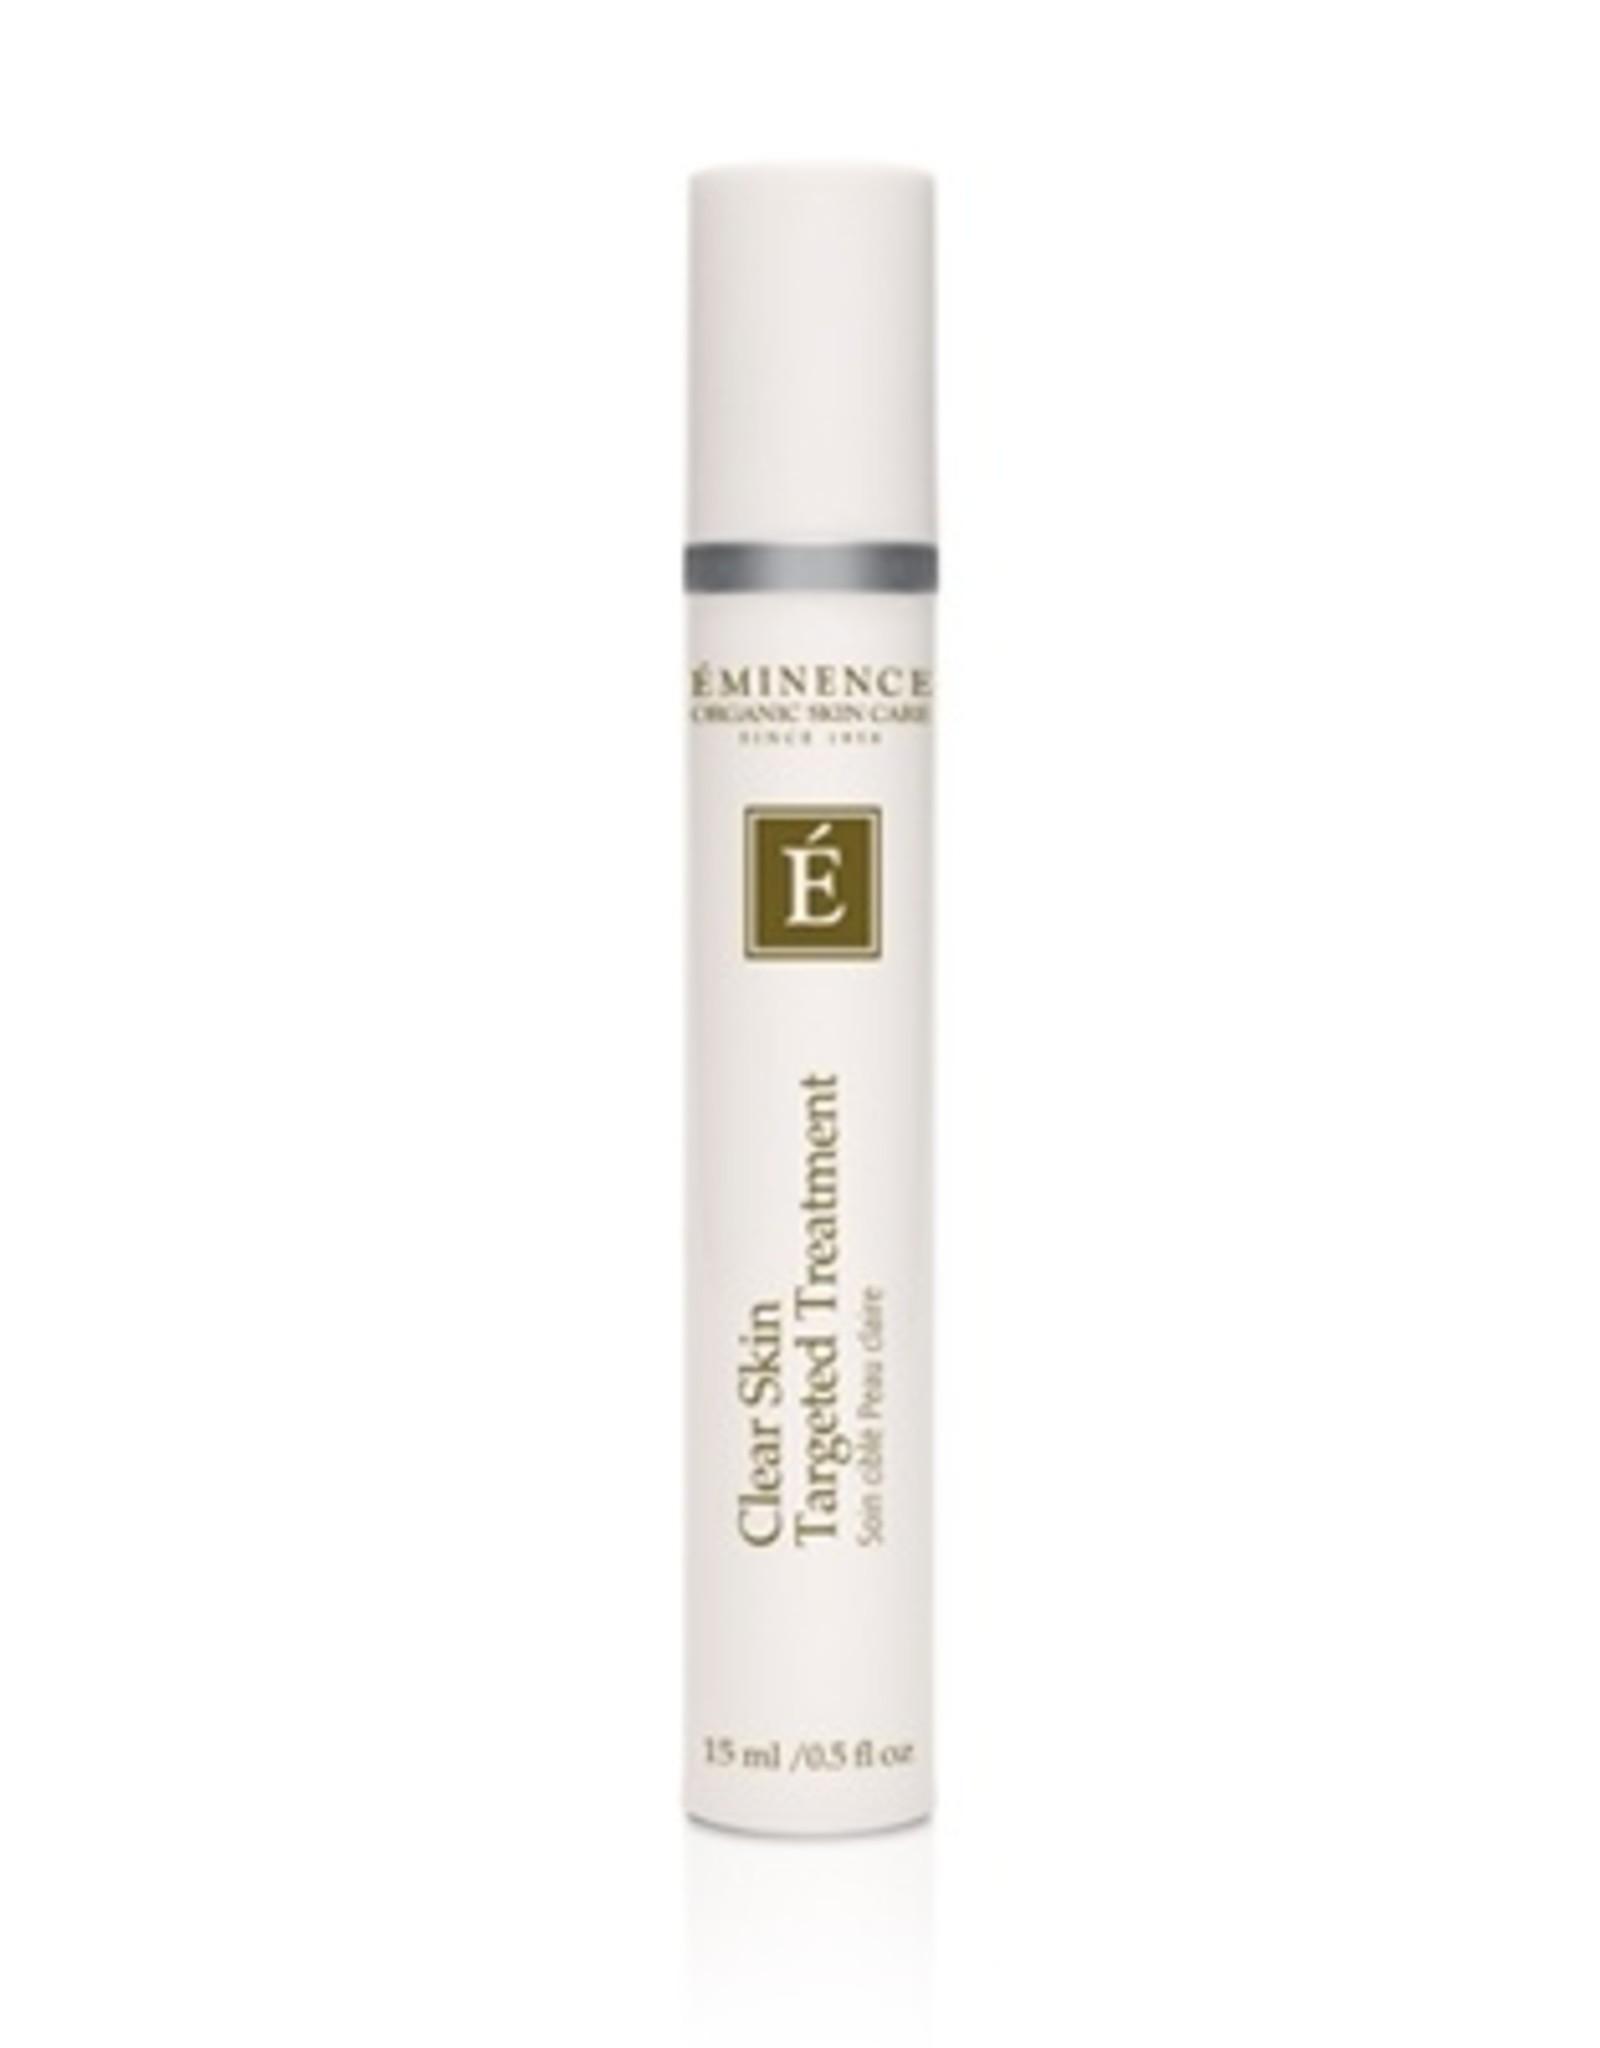 Eminence Organic Skin Care Clear Skin Targeted Acne Treatment